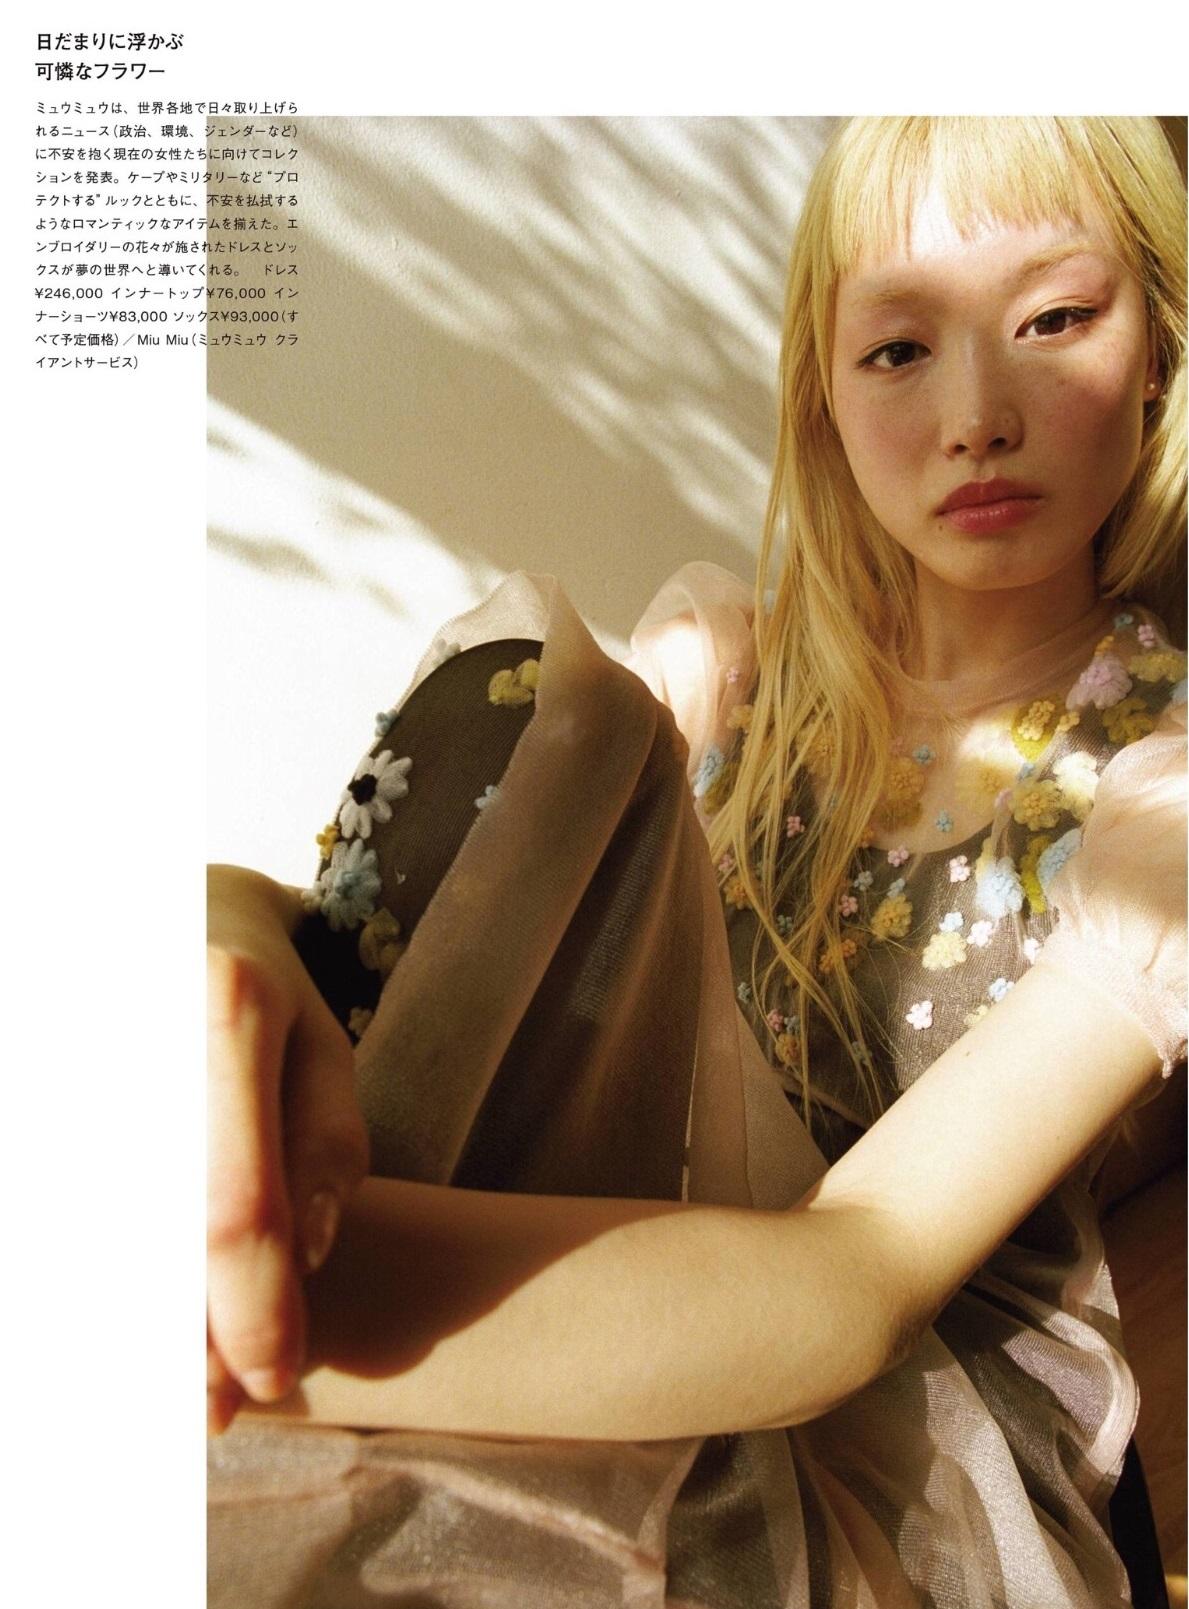 Fernanca Ly by Chad Moore for Numero Tokyo 129 (8).jpg